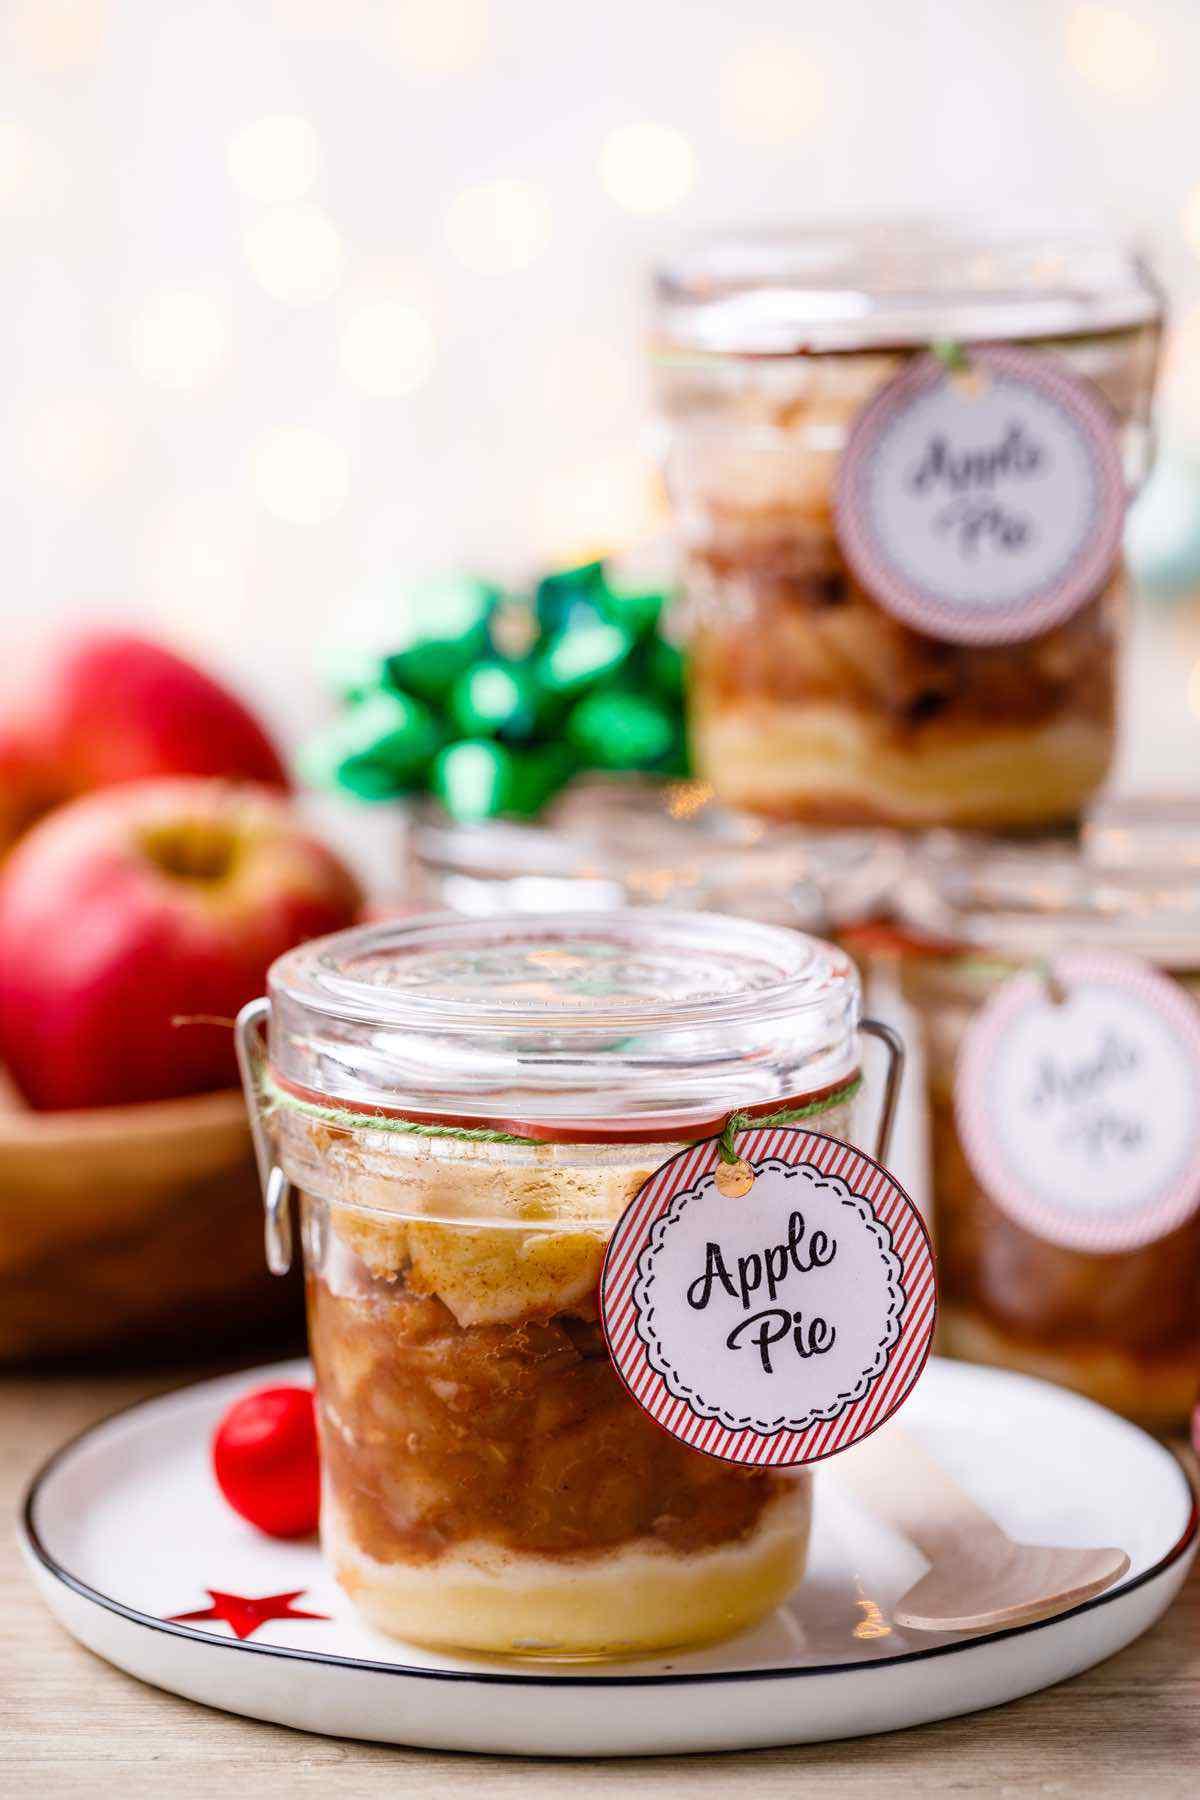 Homemade Apple Pie In a Jar